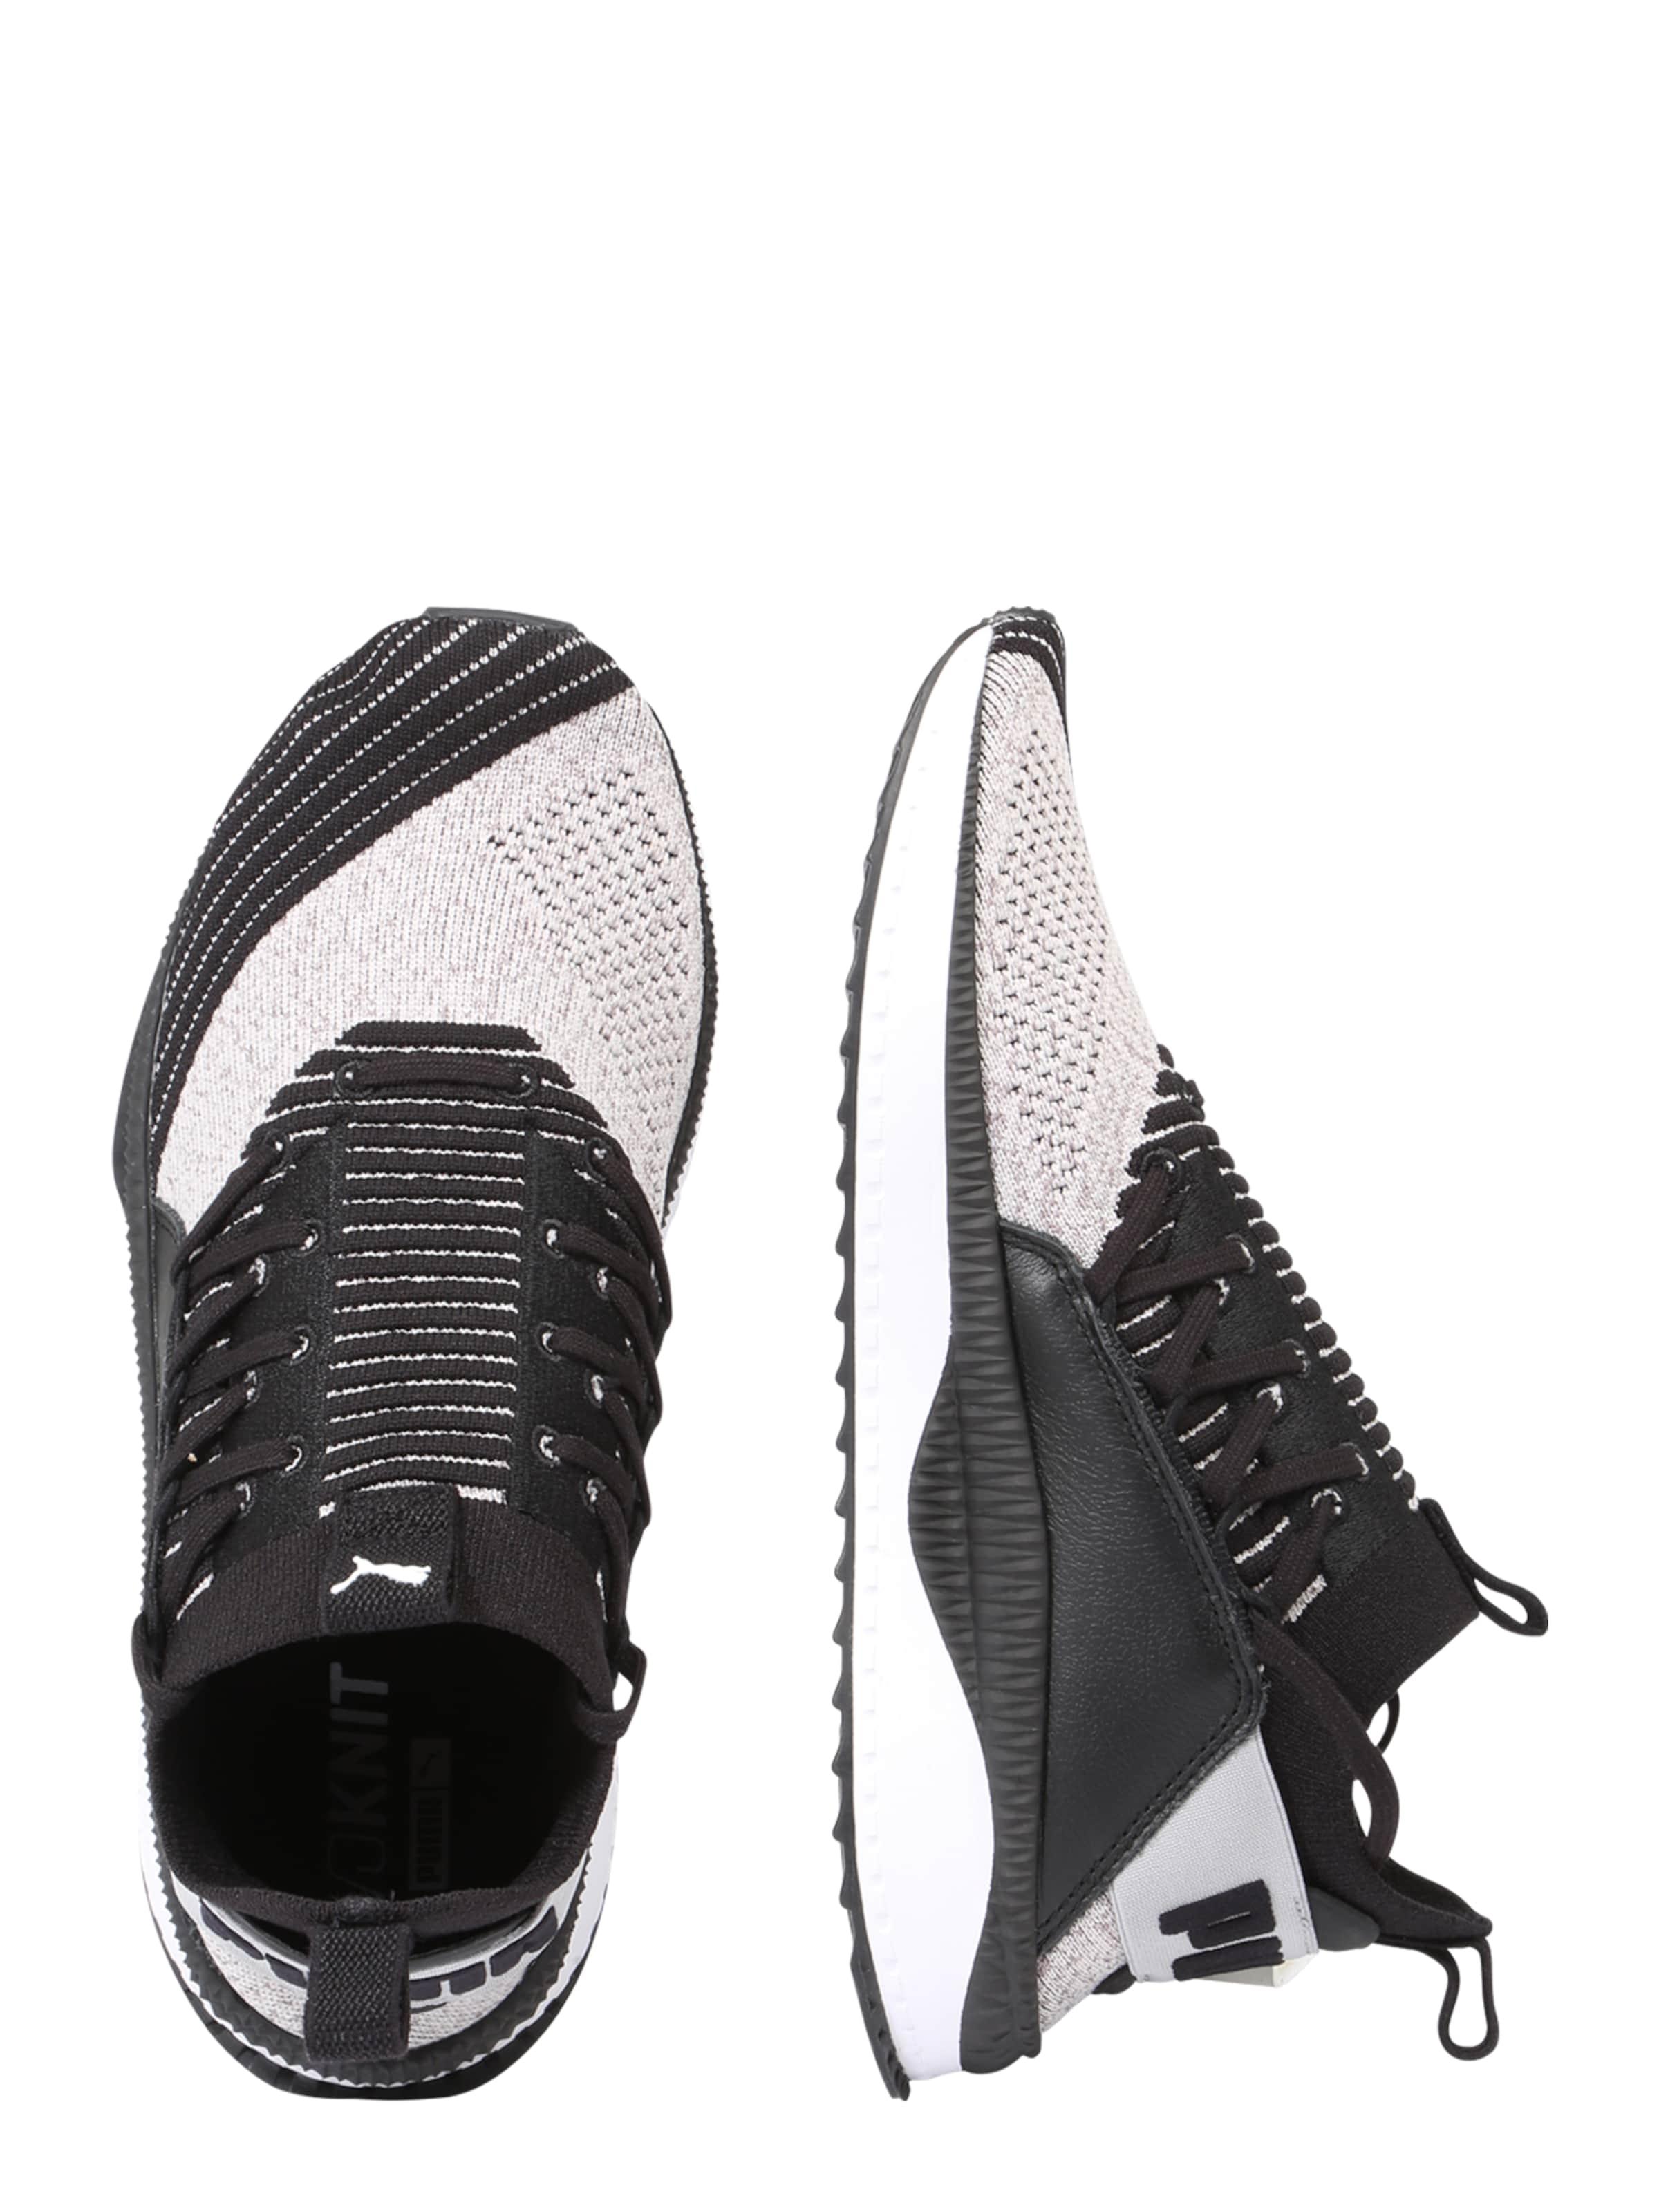 Jun' Sneaker Weiß Puma In 'tsugi BeigeSchwarz RL34Aj5q